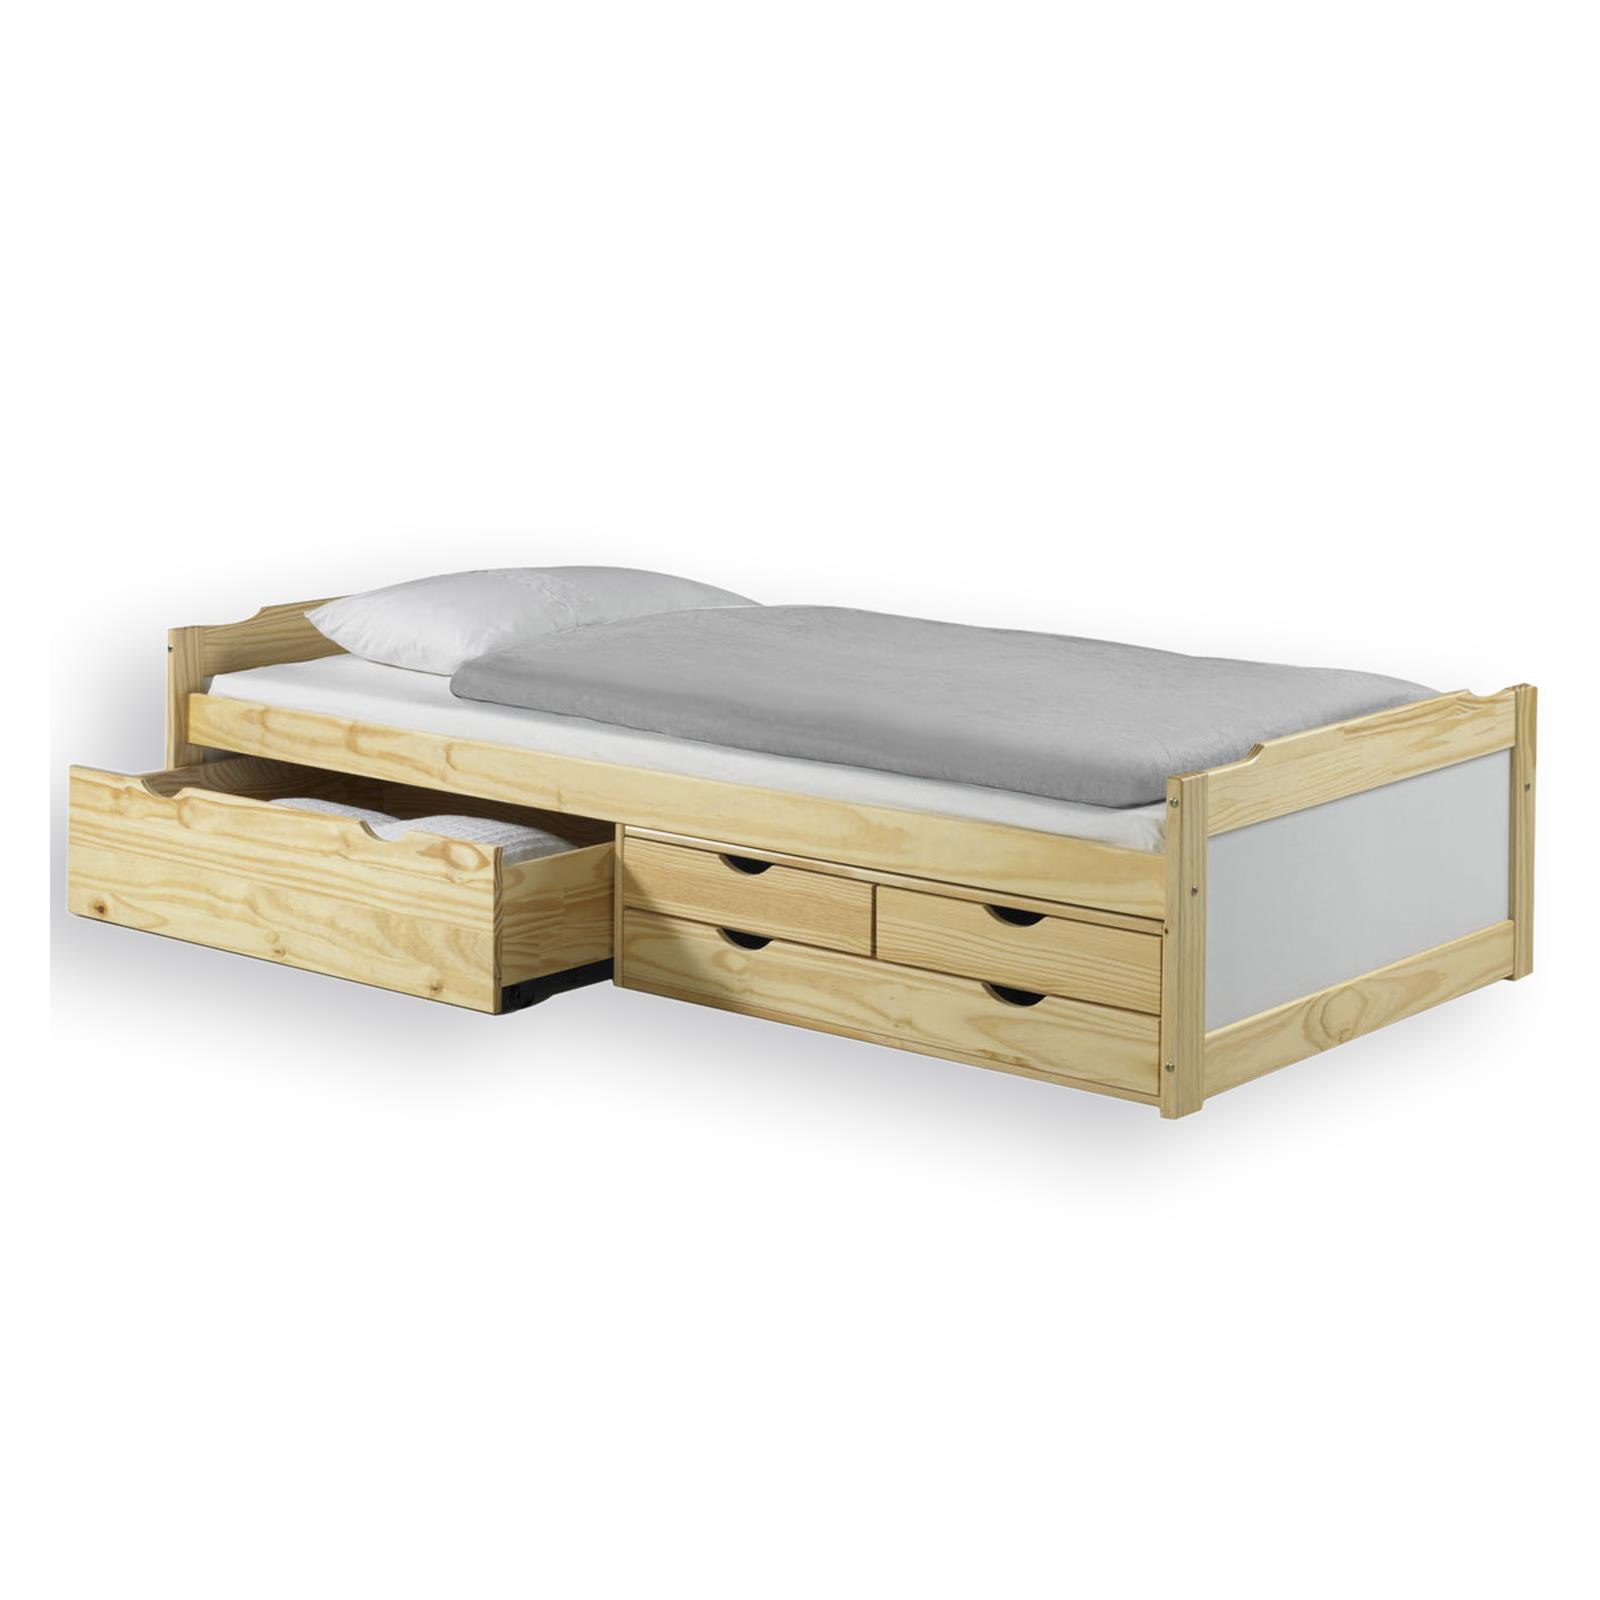 jugendbett funktionsbett kinder g ste einzel auszugs bett 4 schubladen 90x200 cm ebay. Black Bedroom Furniture Sets. Home Design Ideas